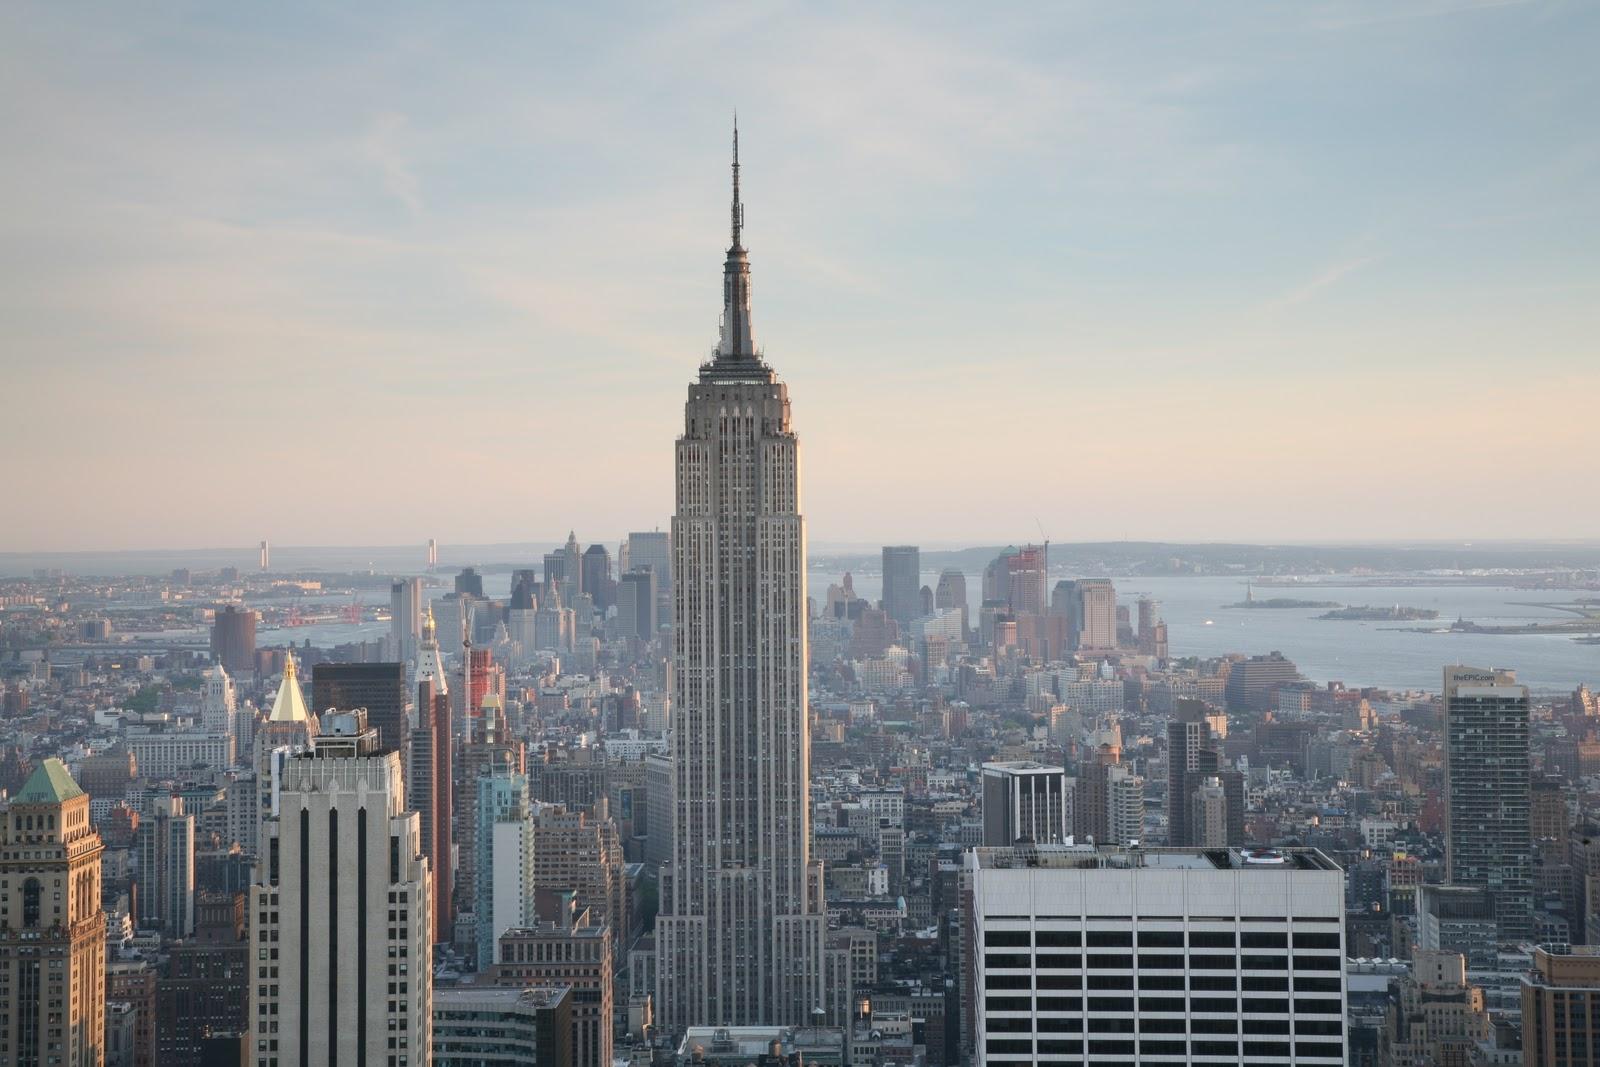 http://1.bp.blogspot.com/-Ifs0A9pDuMA/TVndpQt2hGI/AAAAAAAAA_U/jy9yPKPf1GU/s1600/NYC_Empire_State_Building.jpg